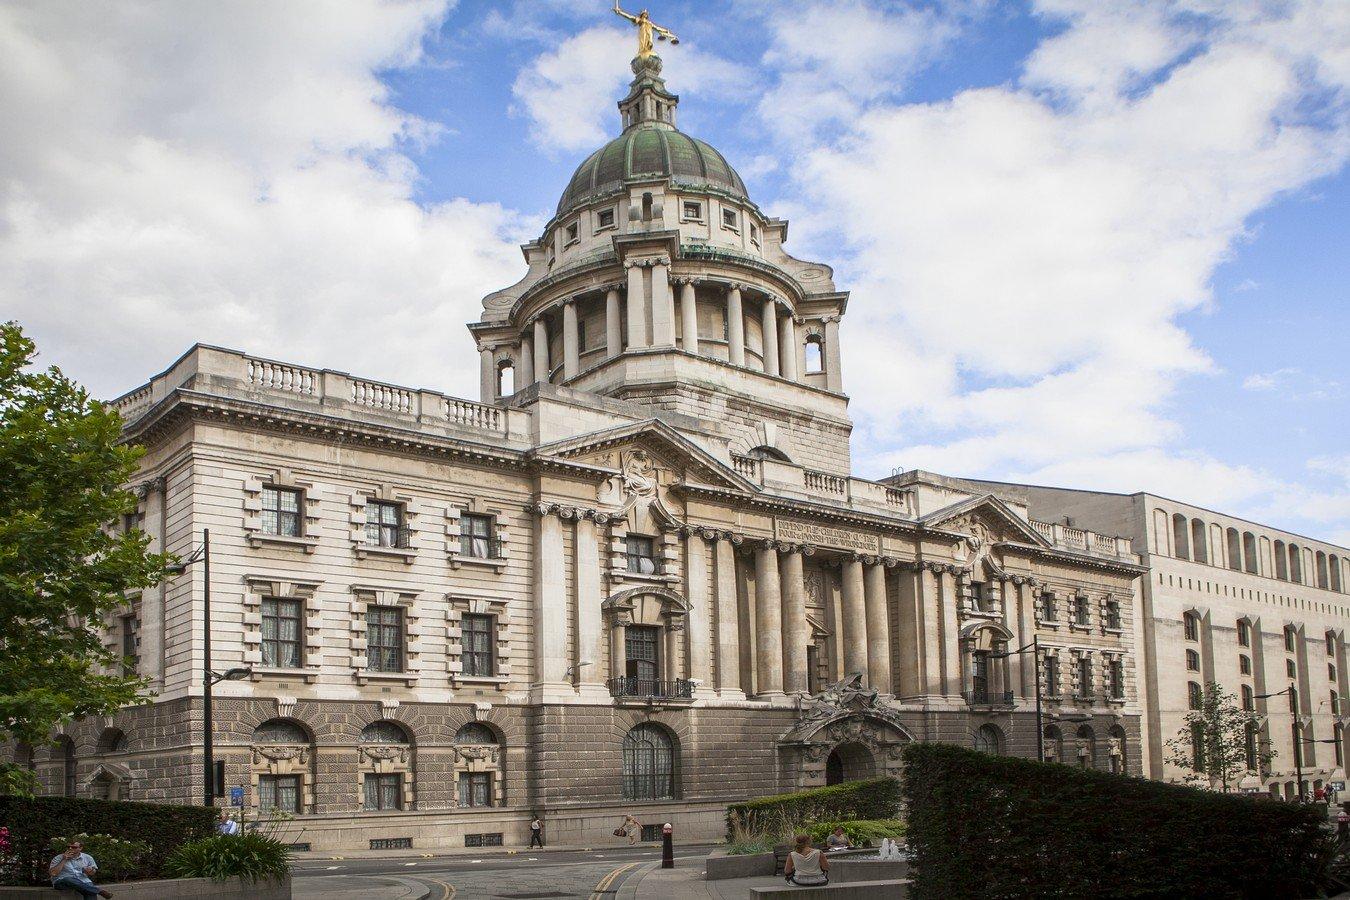 LONDON (UK) - Study visit & observation of jury trials